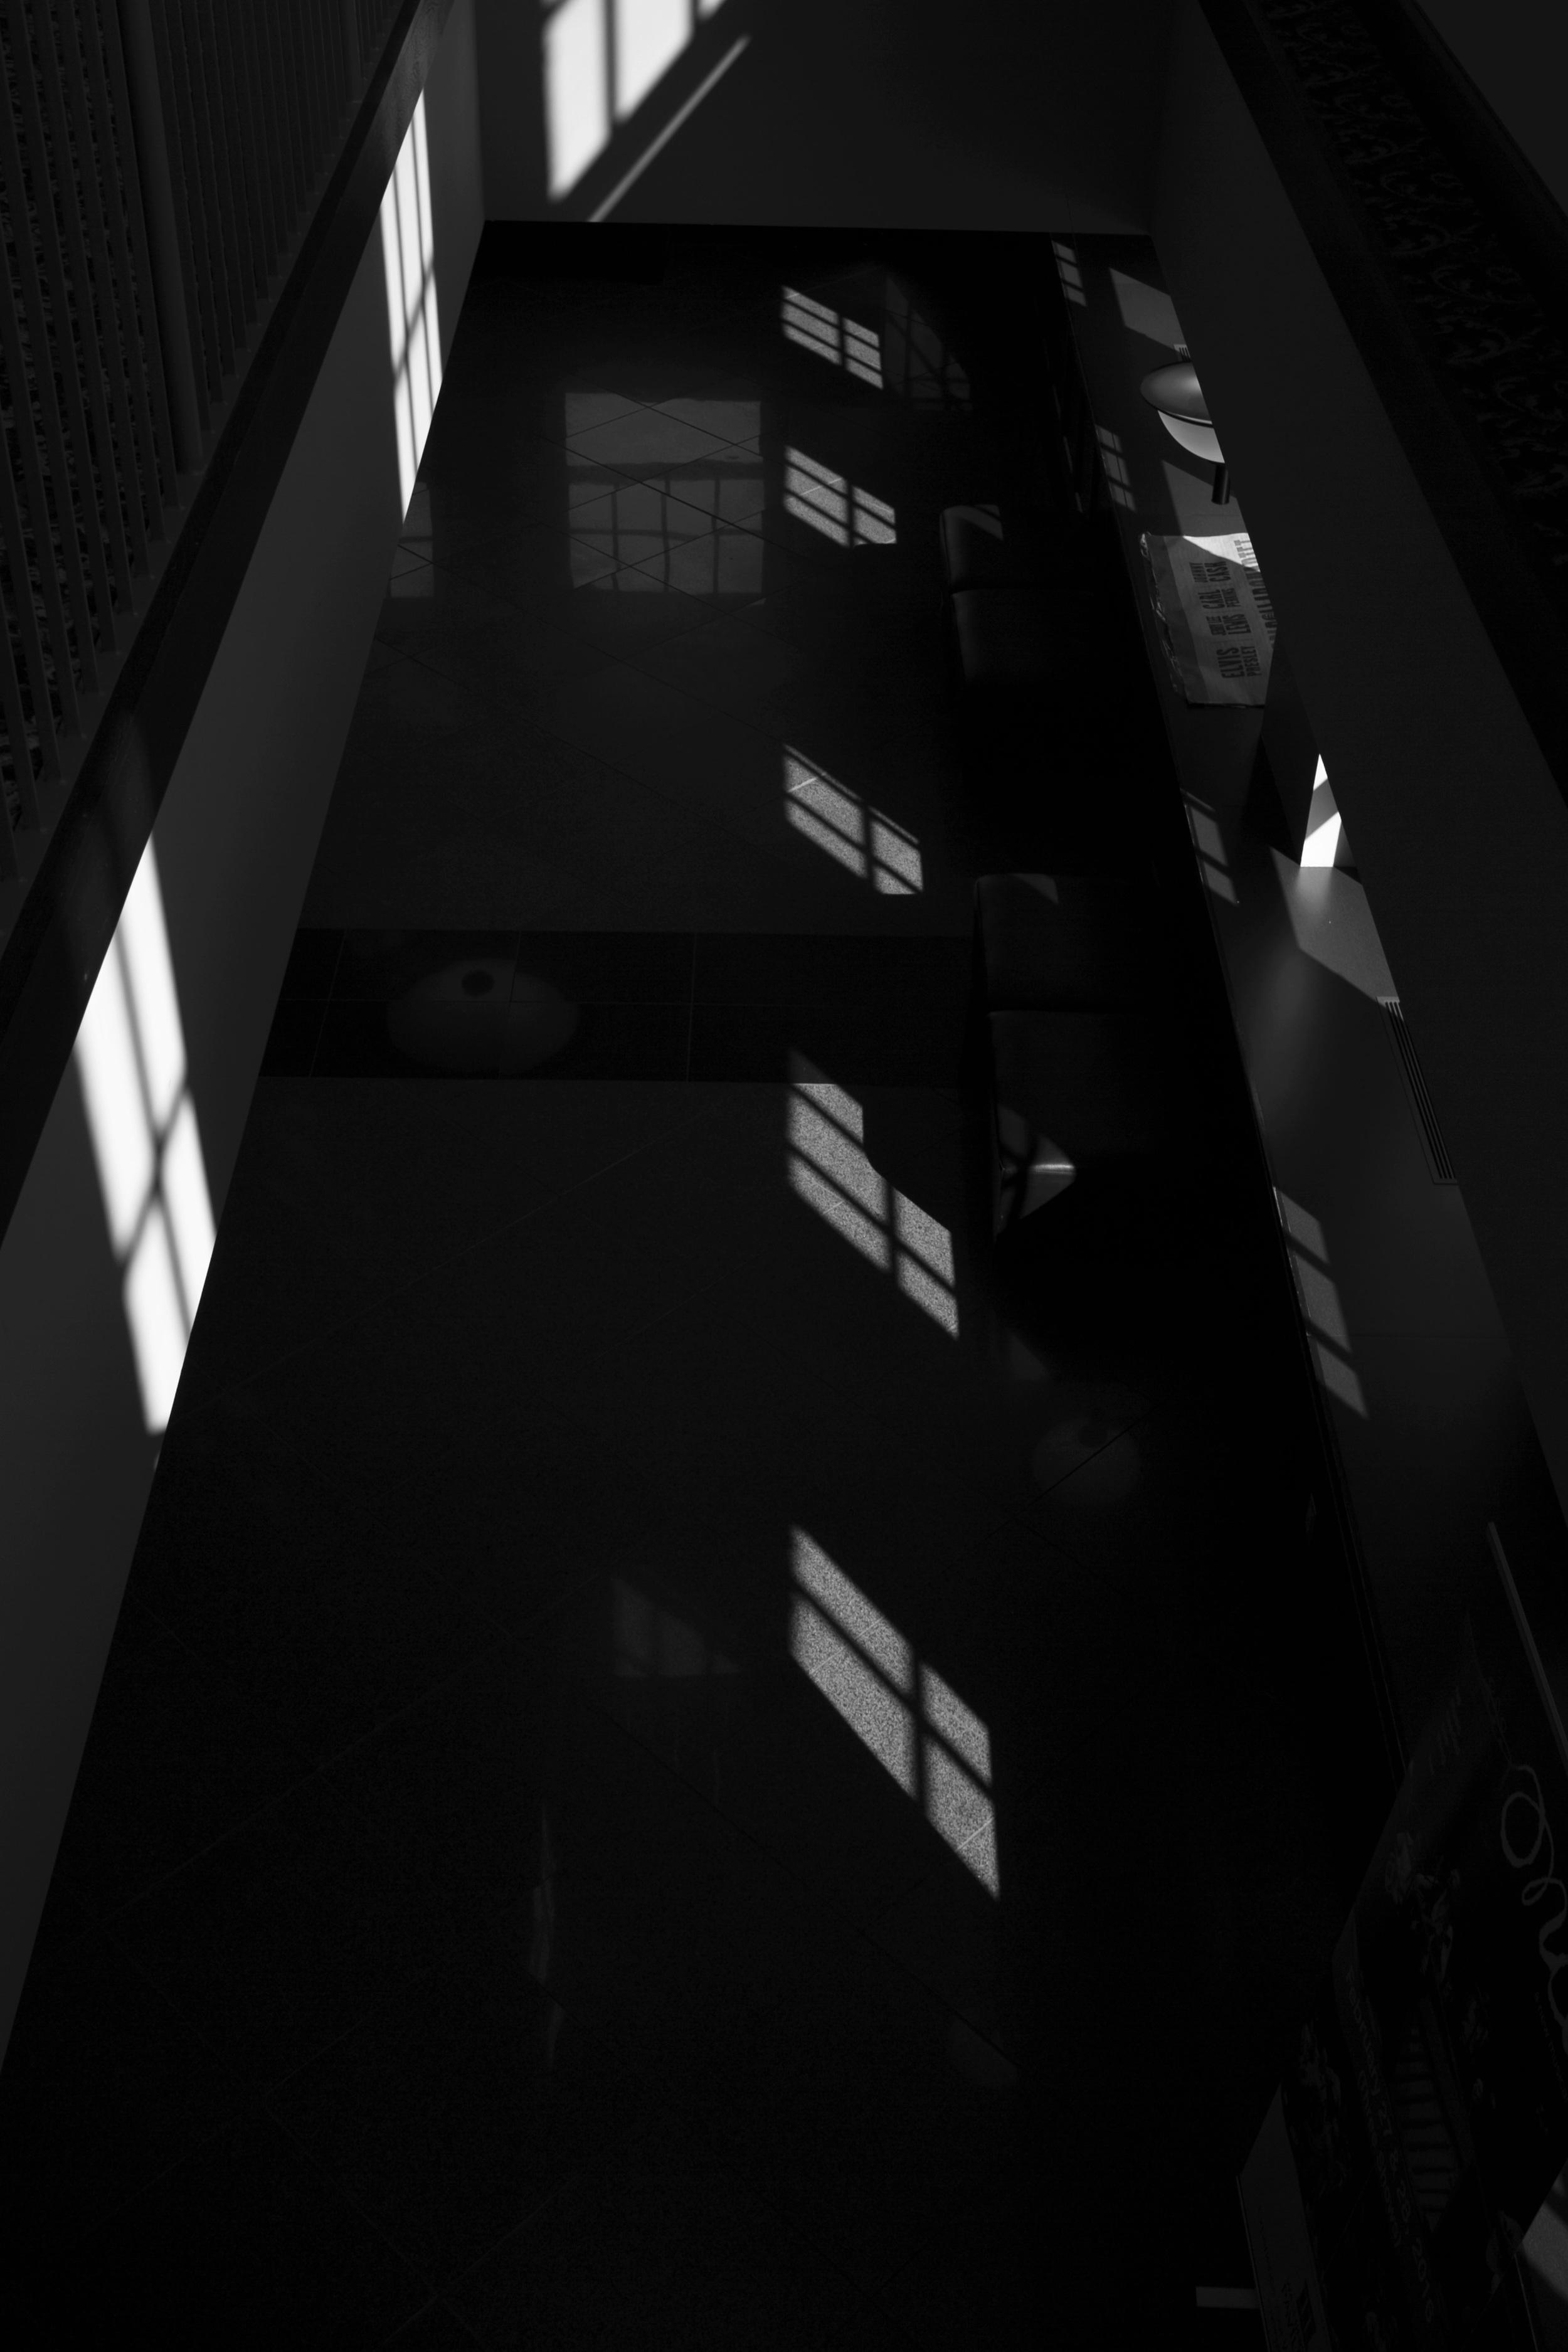 window_shadows_02.jpg